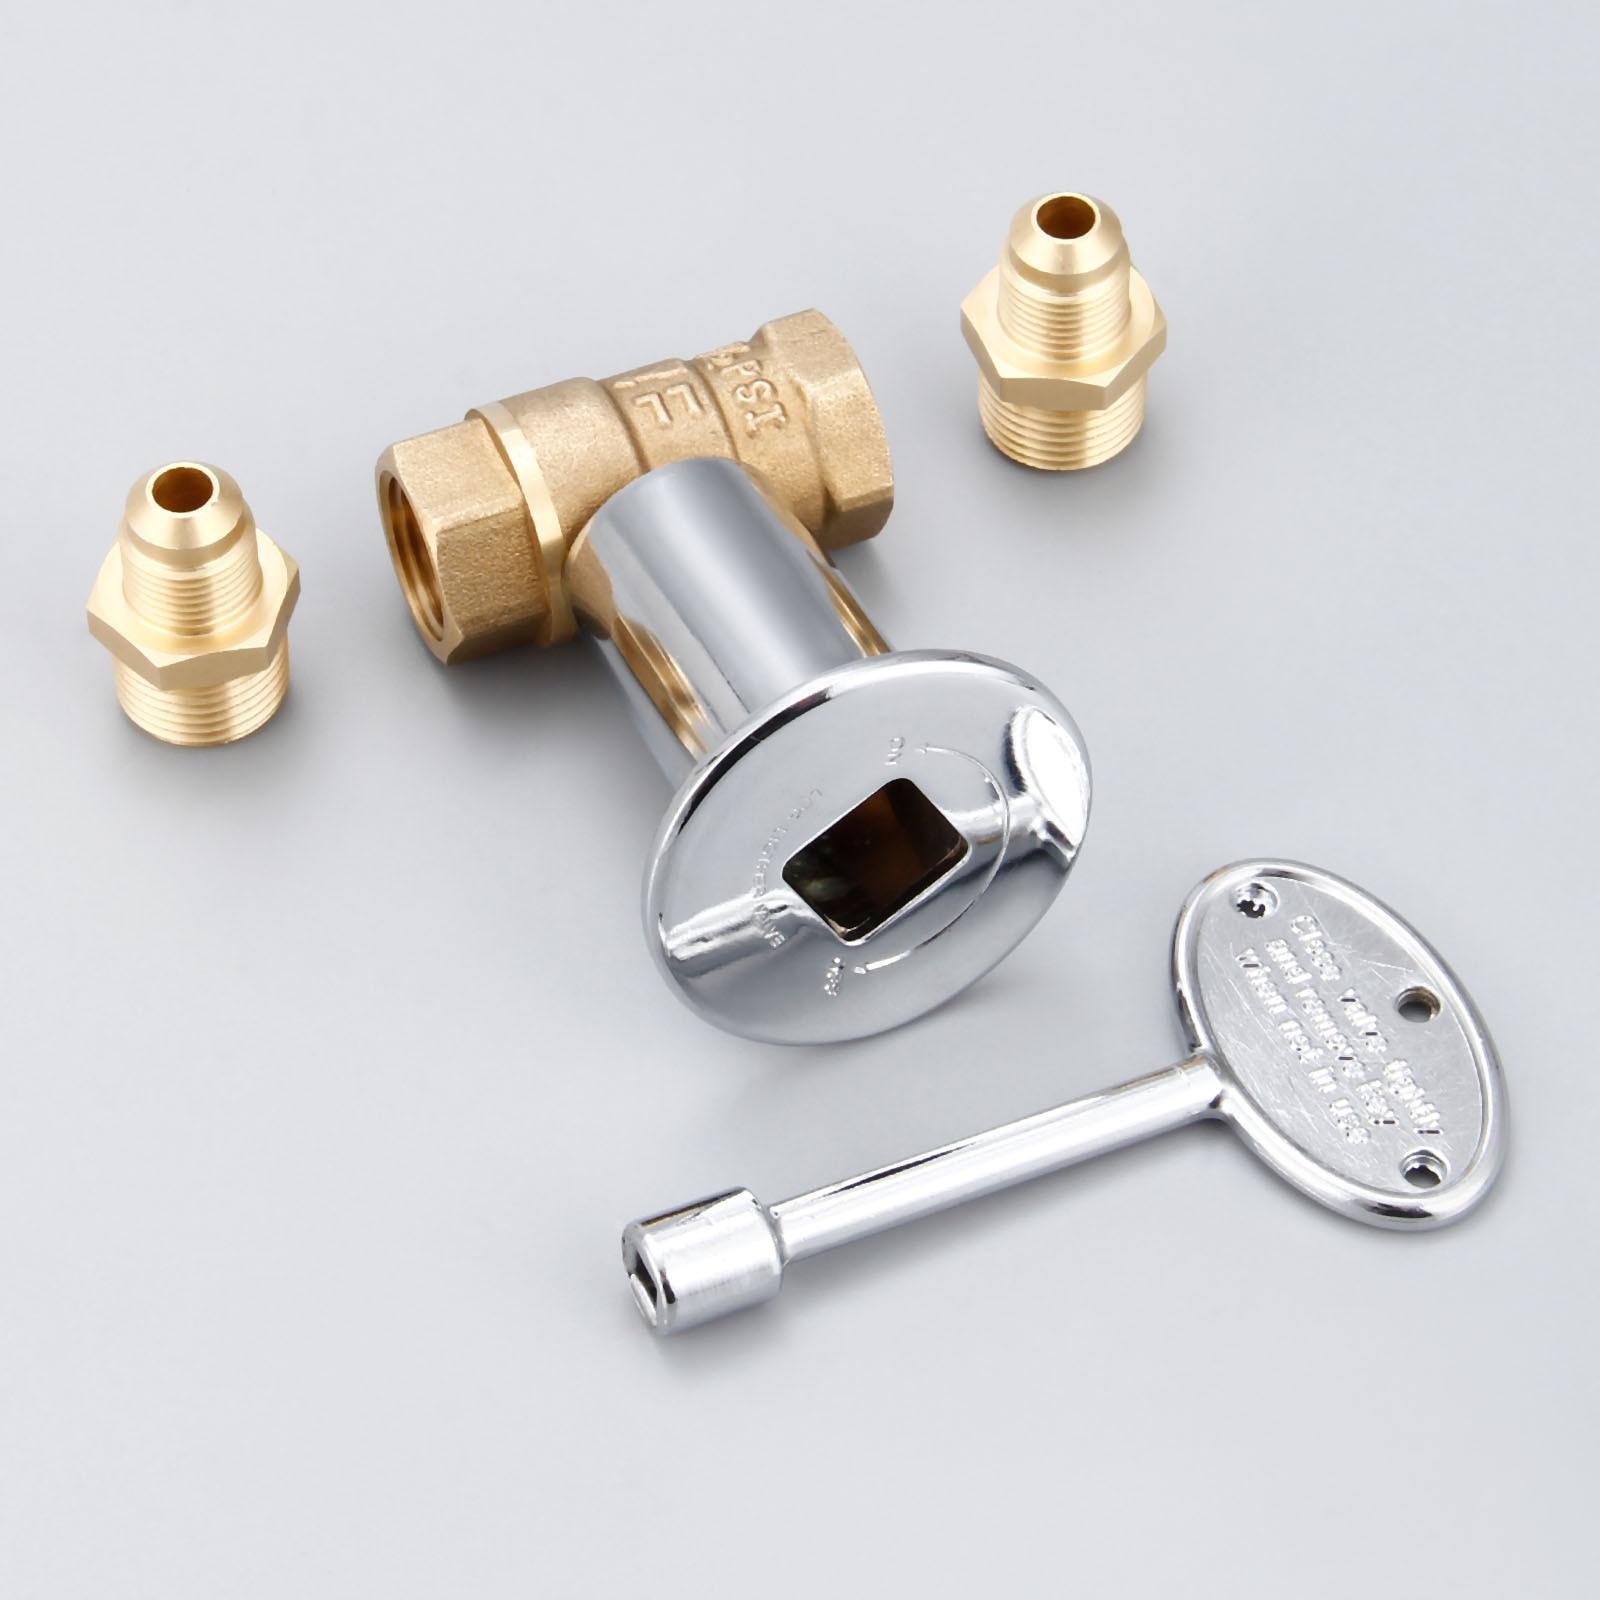 1/2Inch Straight Quarter Turn Shut-Off Valve Kit NG LP Gas Fire Pits Chrome Flange Key Valve 3/8